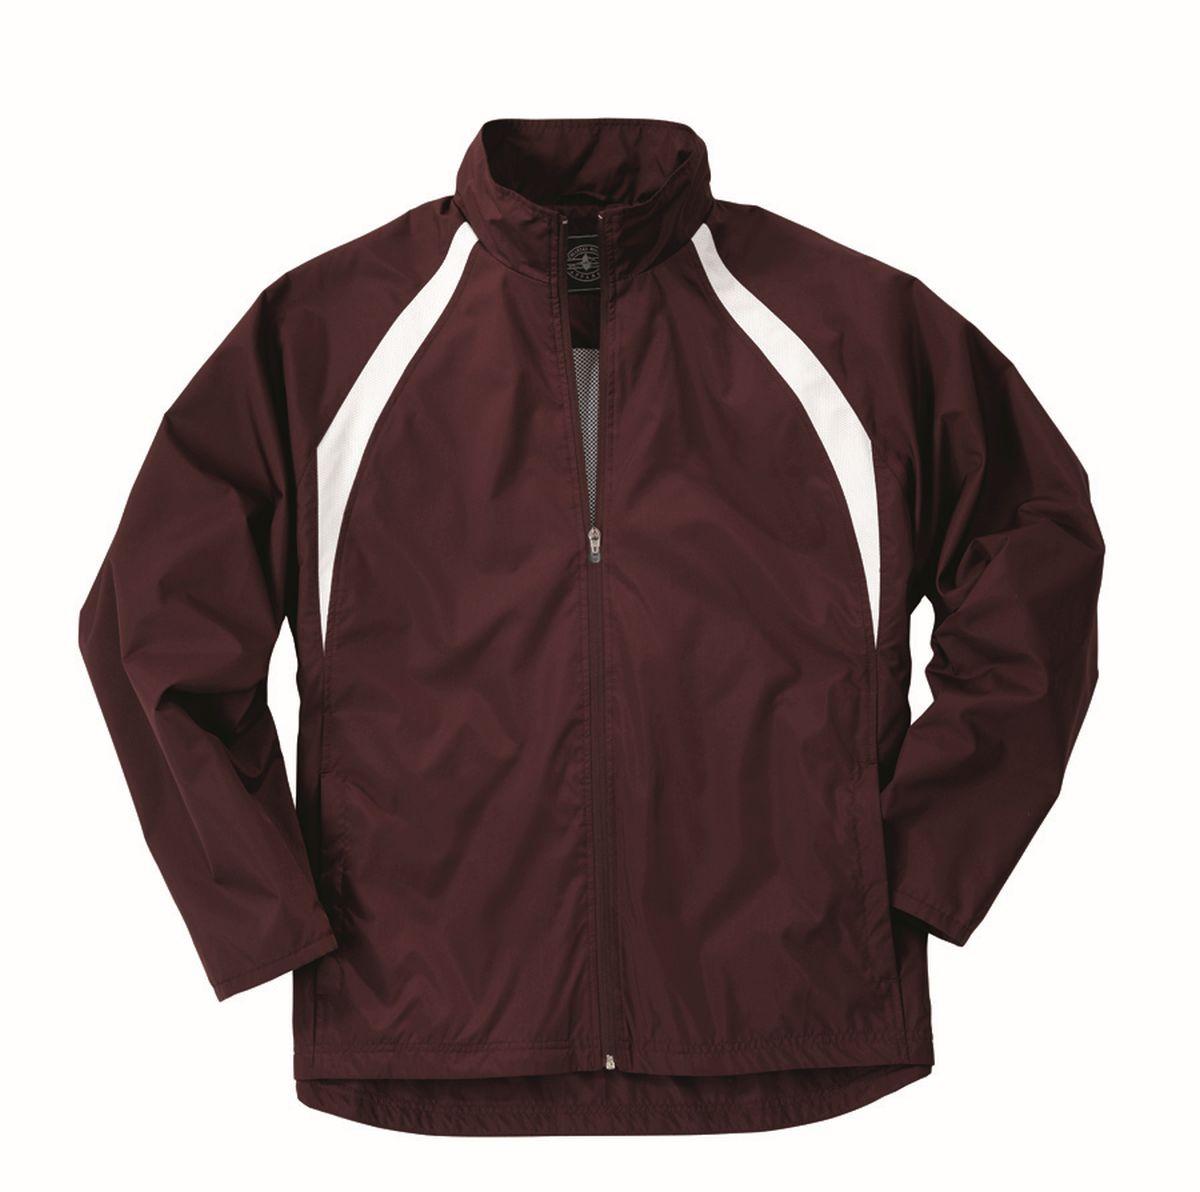 Youth TeamPro Jacket